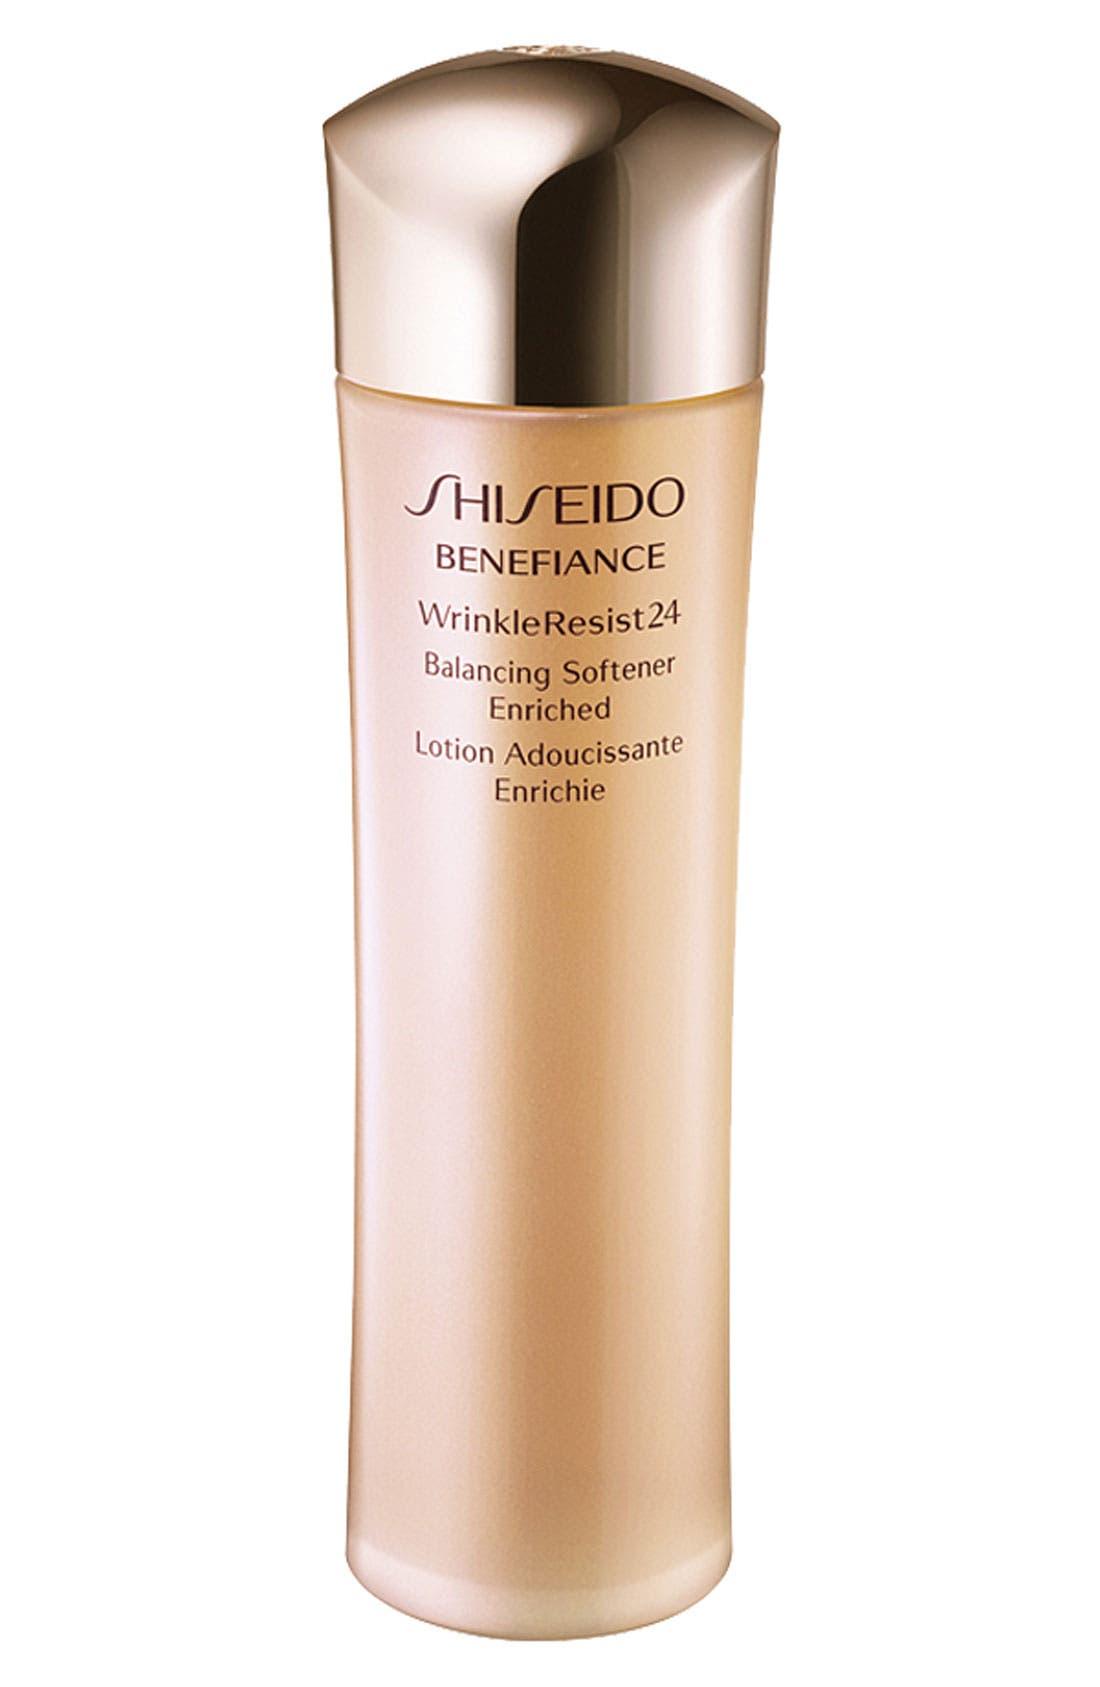 SHISEIDO, Benefiance WrinkleResist24 Balancing Softener Enriched, Main thumbnail 1, color, NO COLOR